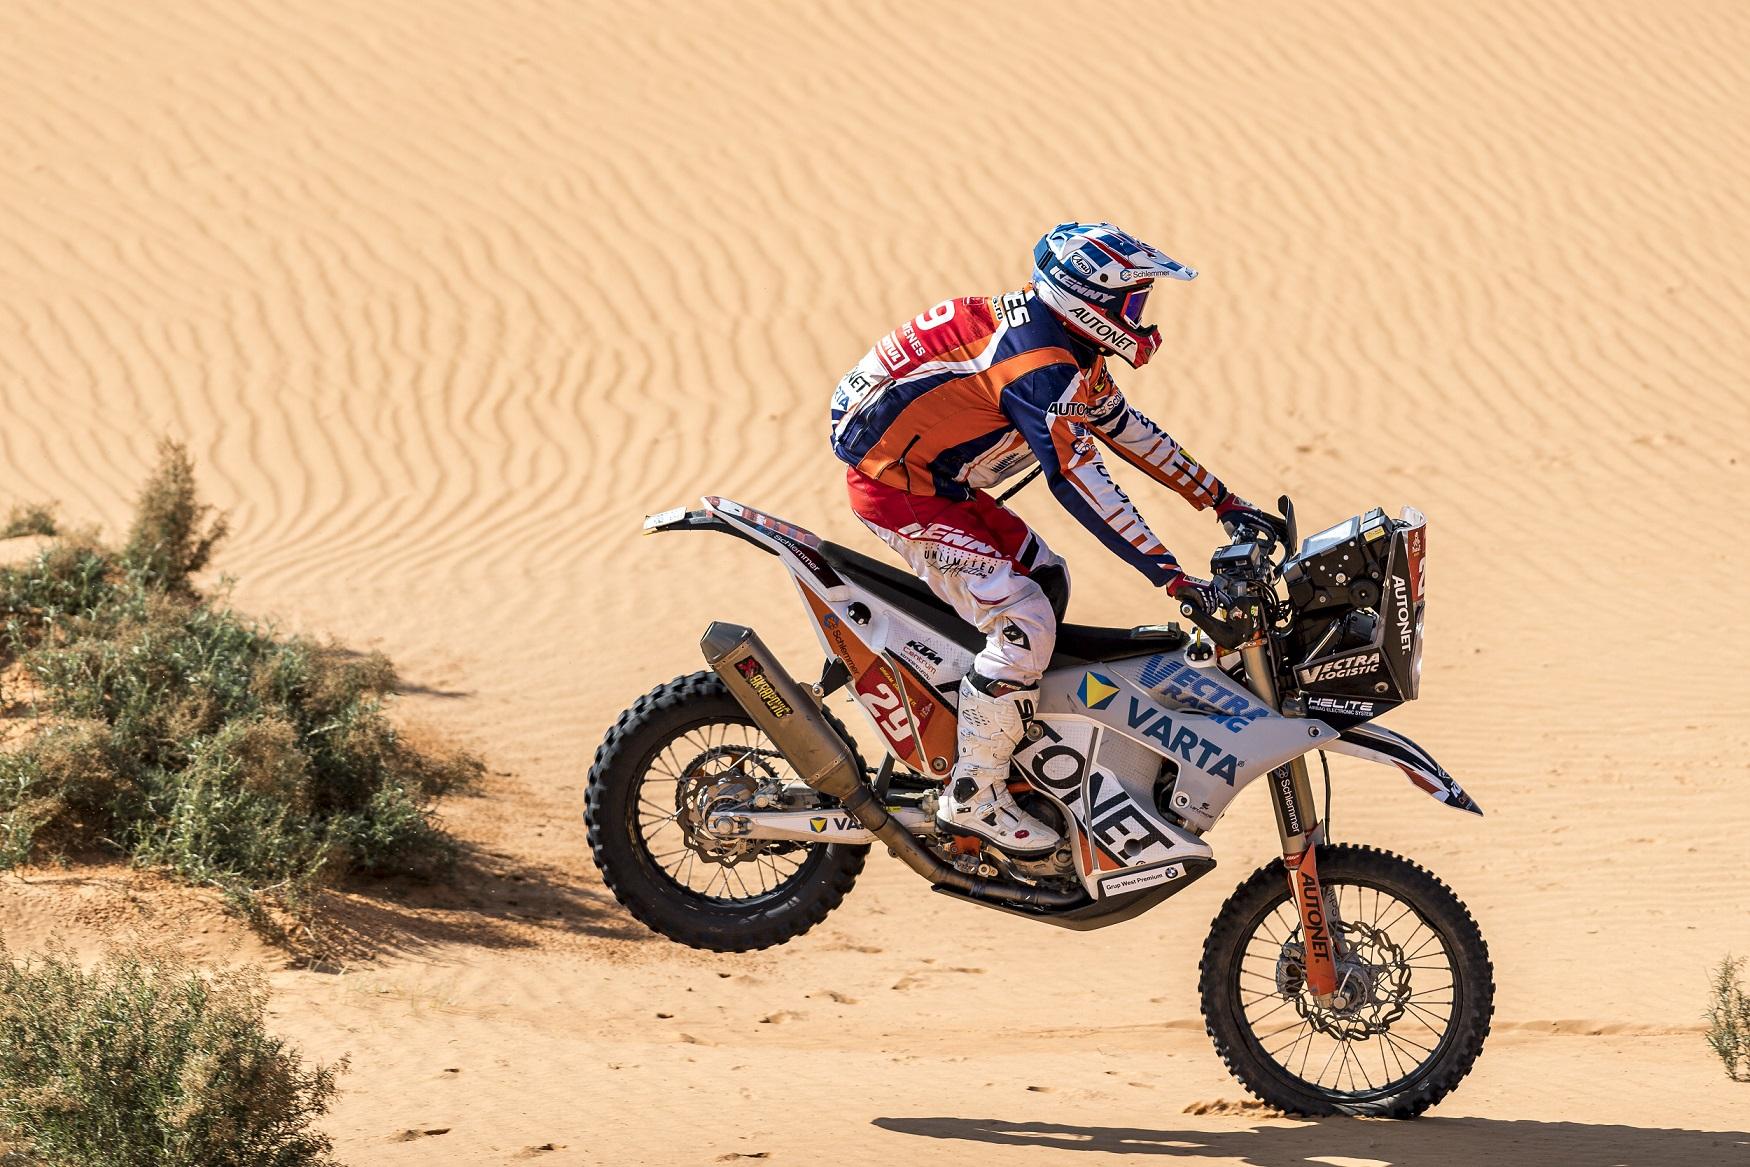 Mani Gyenes – pe locul 3 la jumătatea Dakar 2021